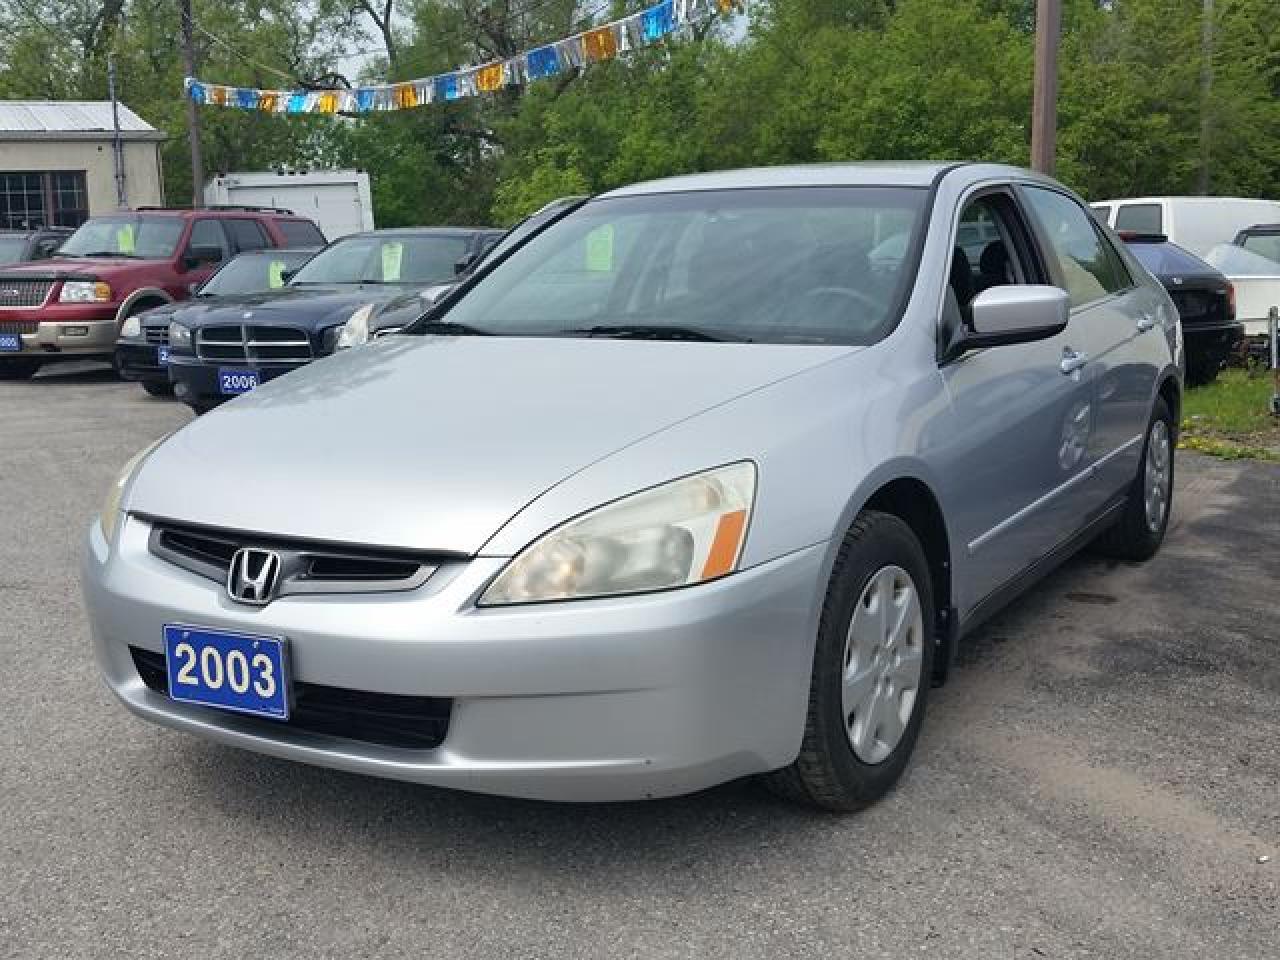 2003 Honda Accord Sdn LX-G,certified